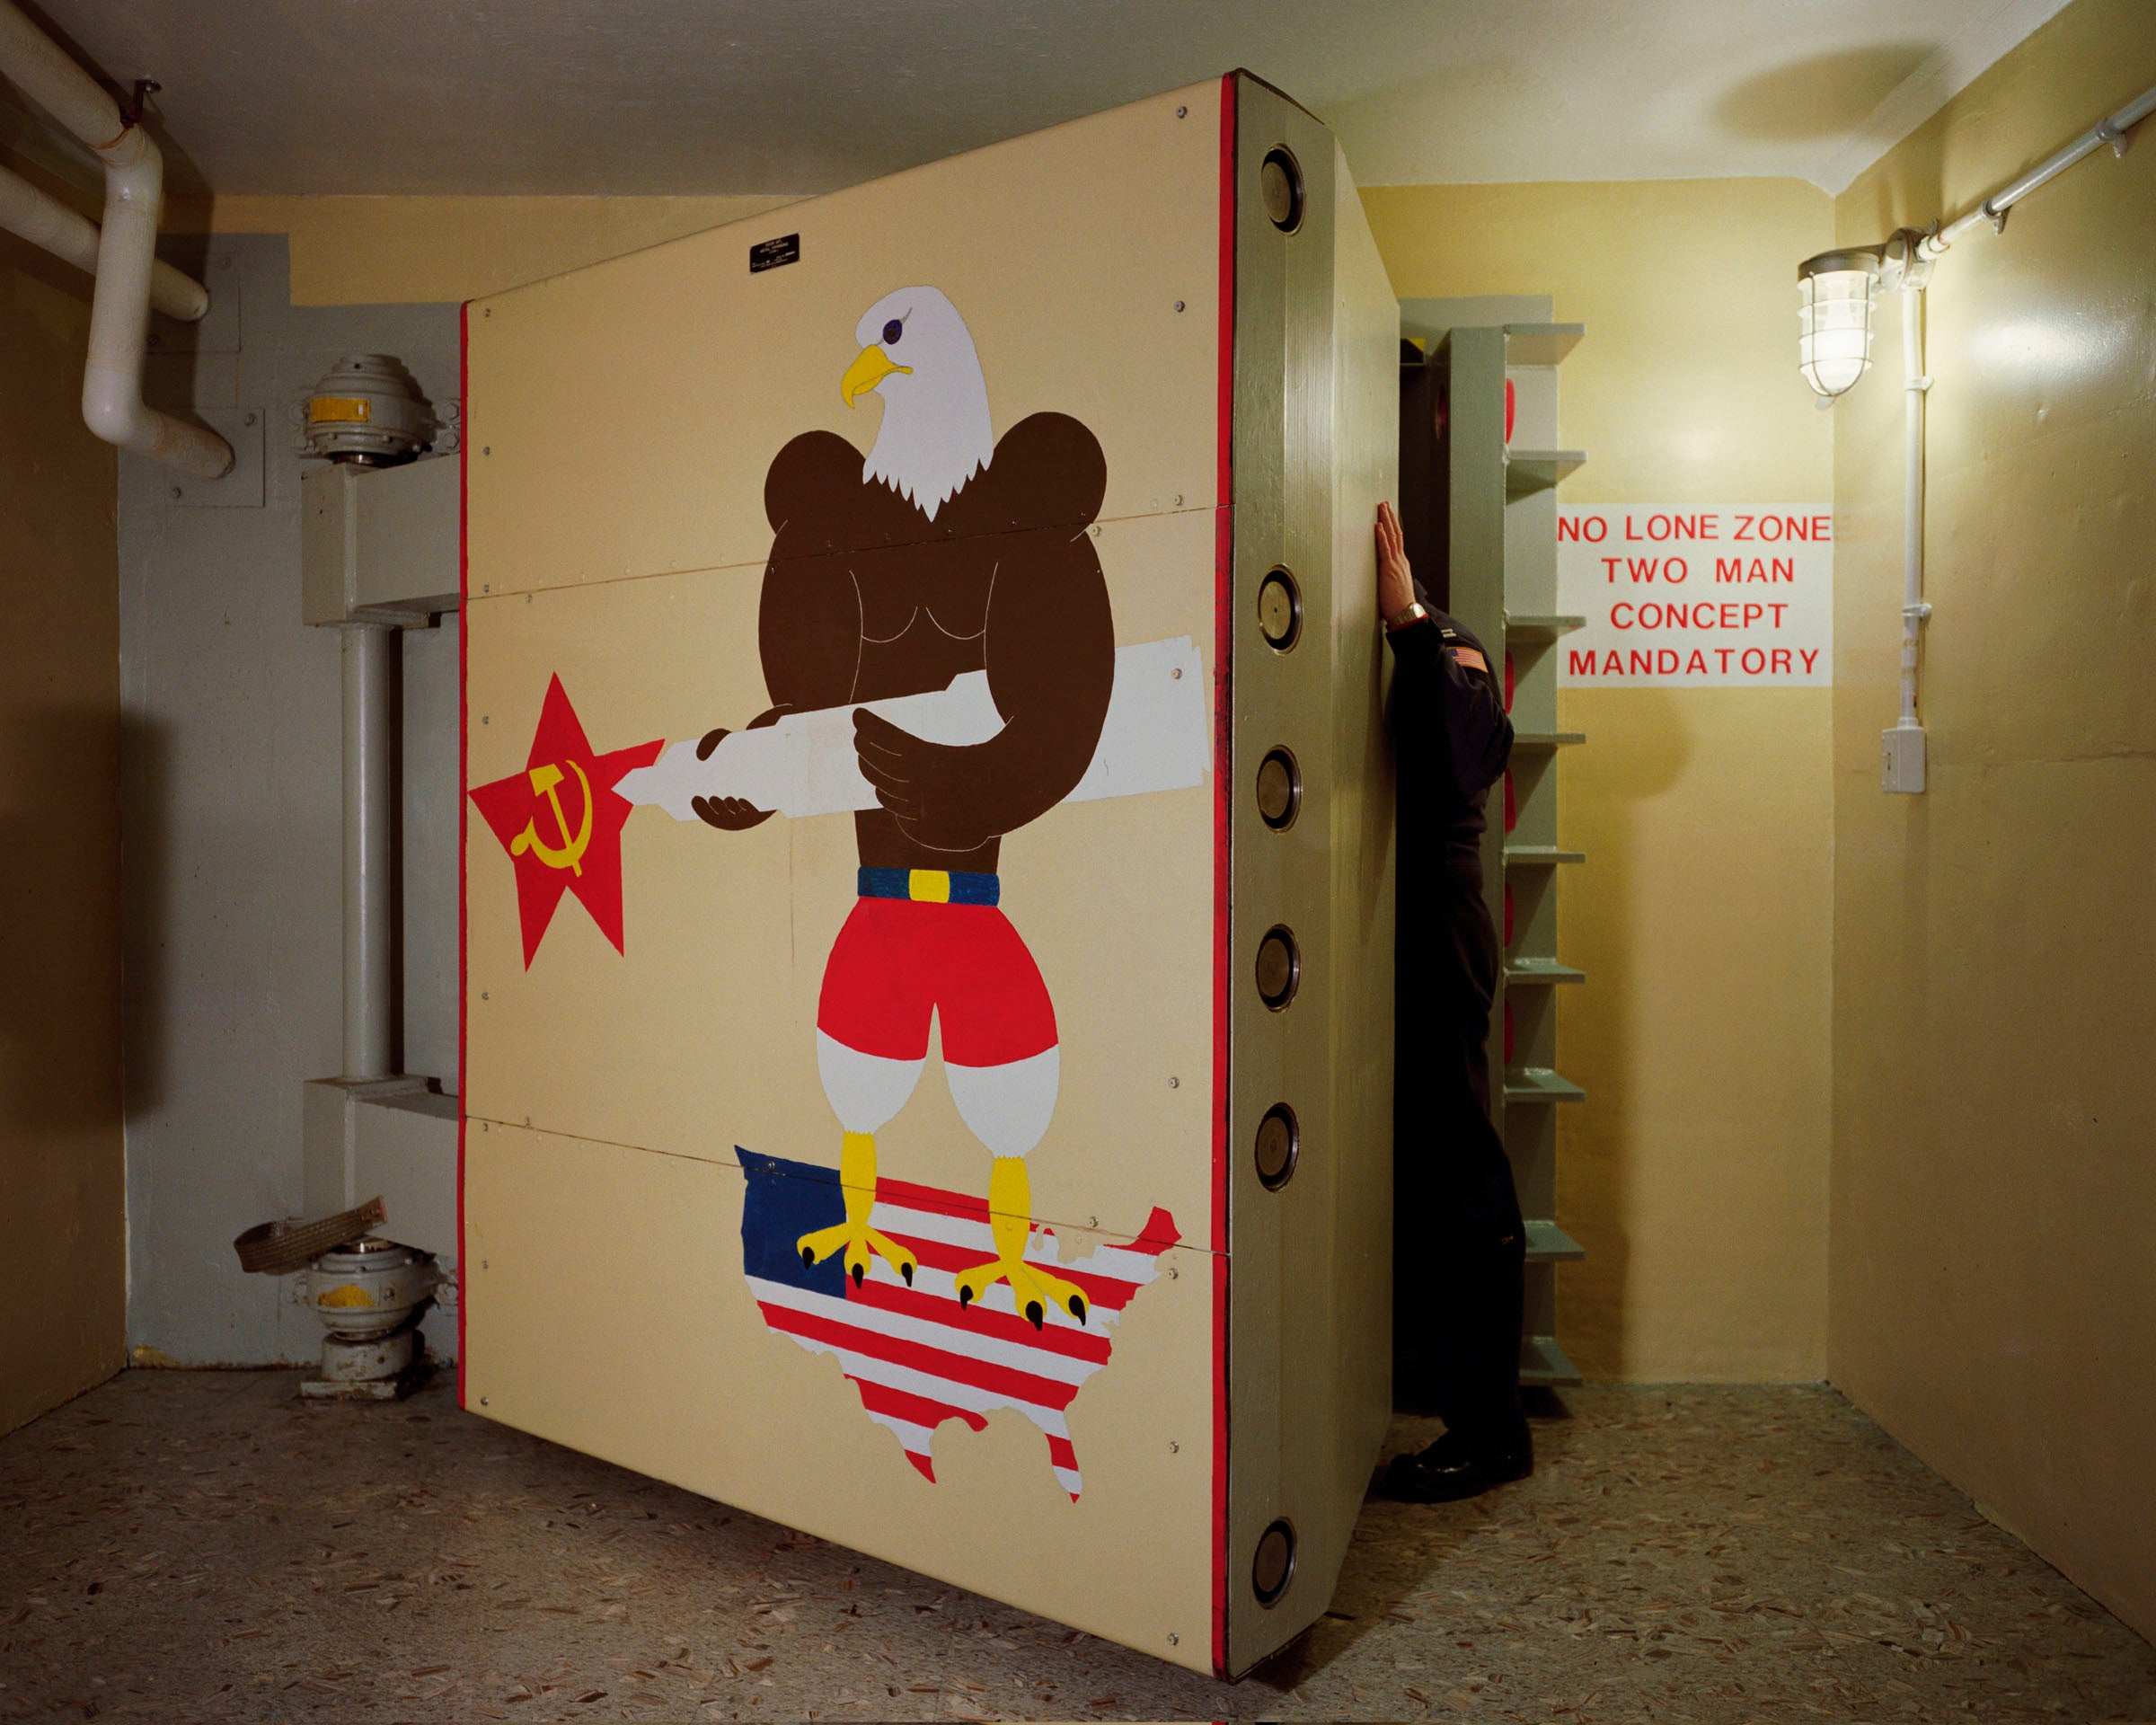 "Photo: Paul Shambroom, Untitled (Blast door, ""November 1"" Minuteman II Launch Control Center, Newell, South Dakota.), (#1251/18-19) 1992, Colour coupler print, 16X20 inches, Photo courtesy of Paul Shambroom."